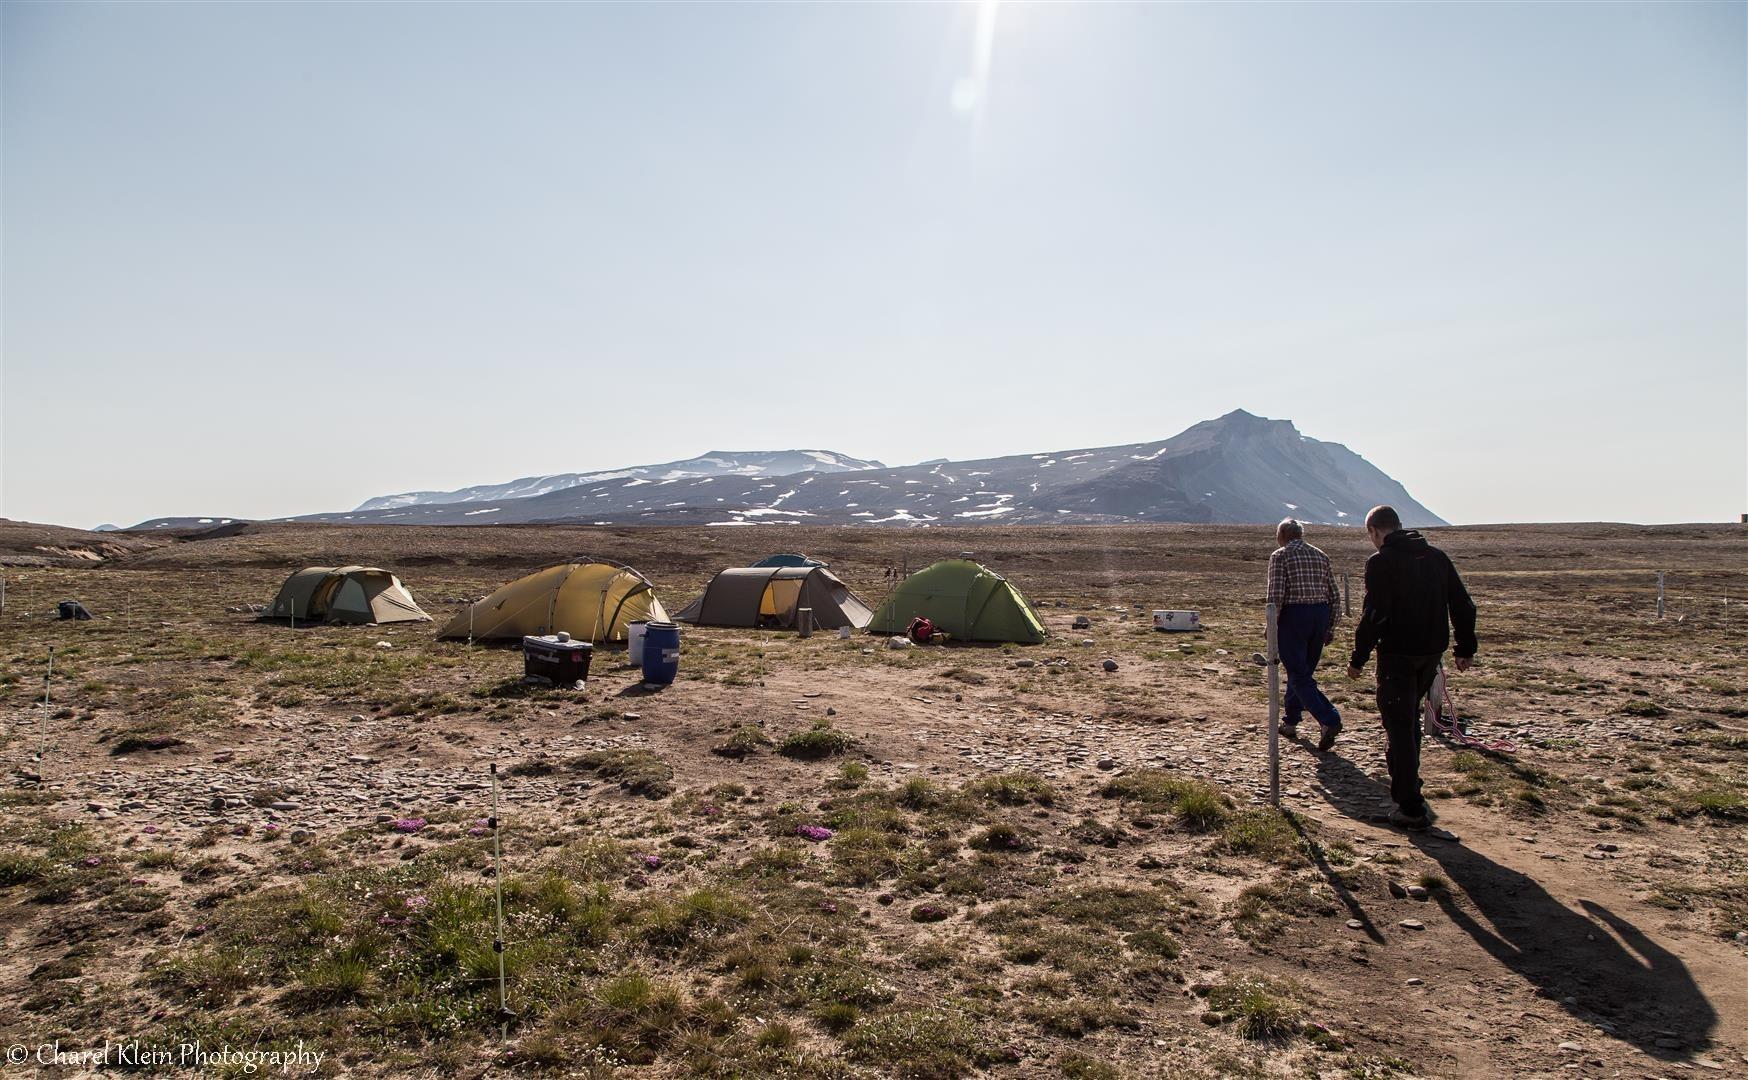 Karupelv Valley Project camp